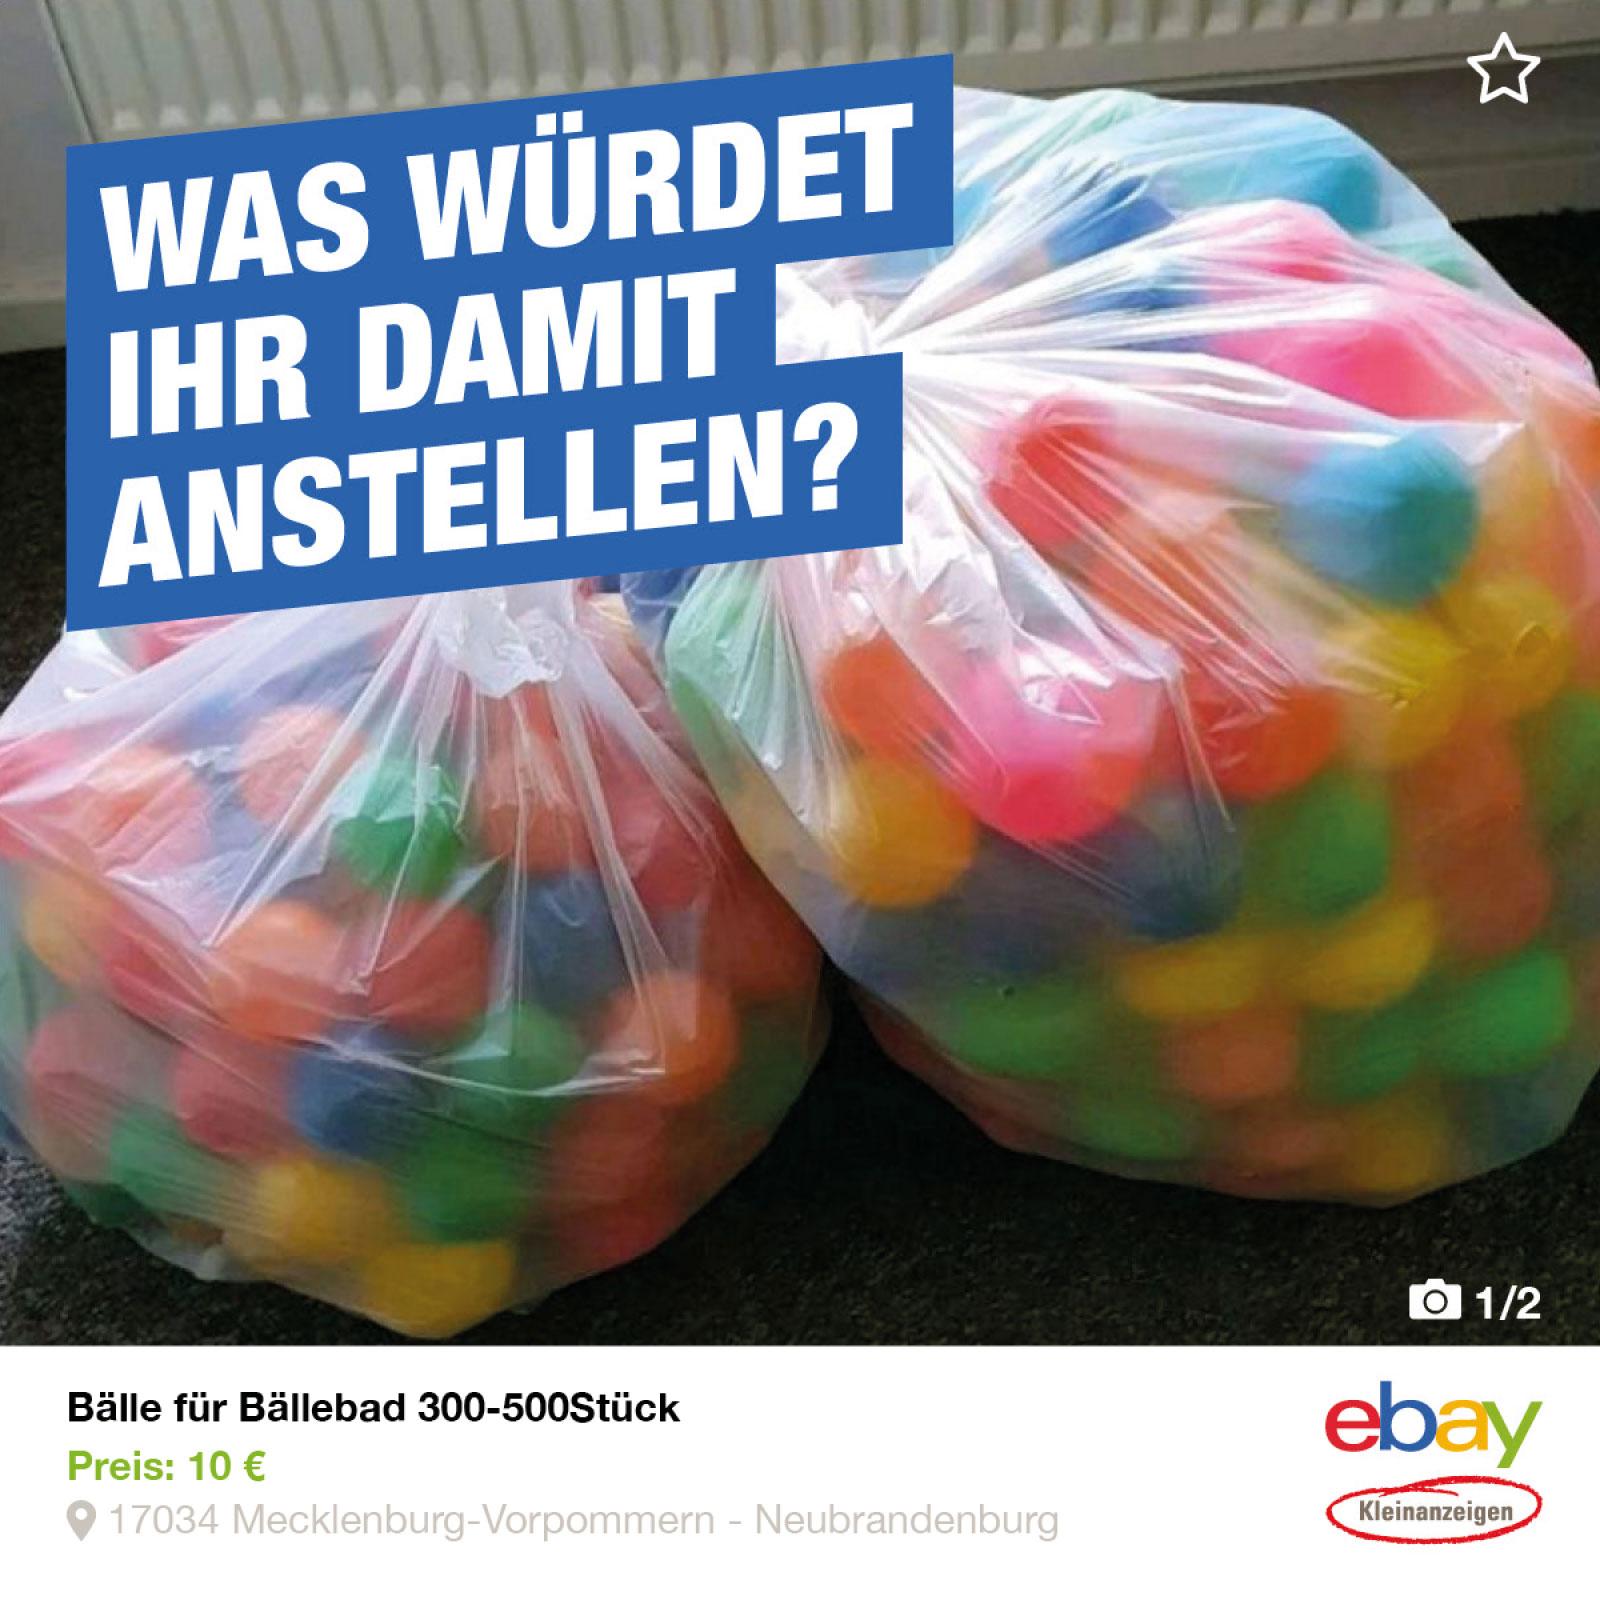 ebay_postings_14x14_rz_88